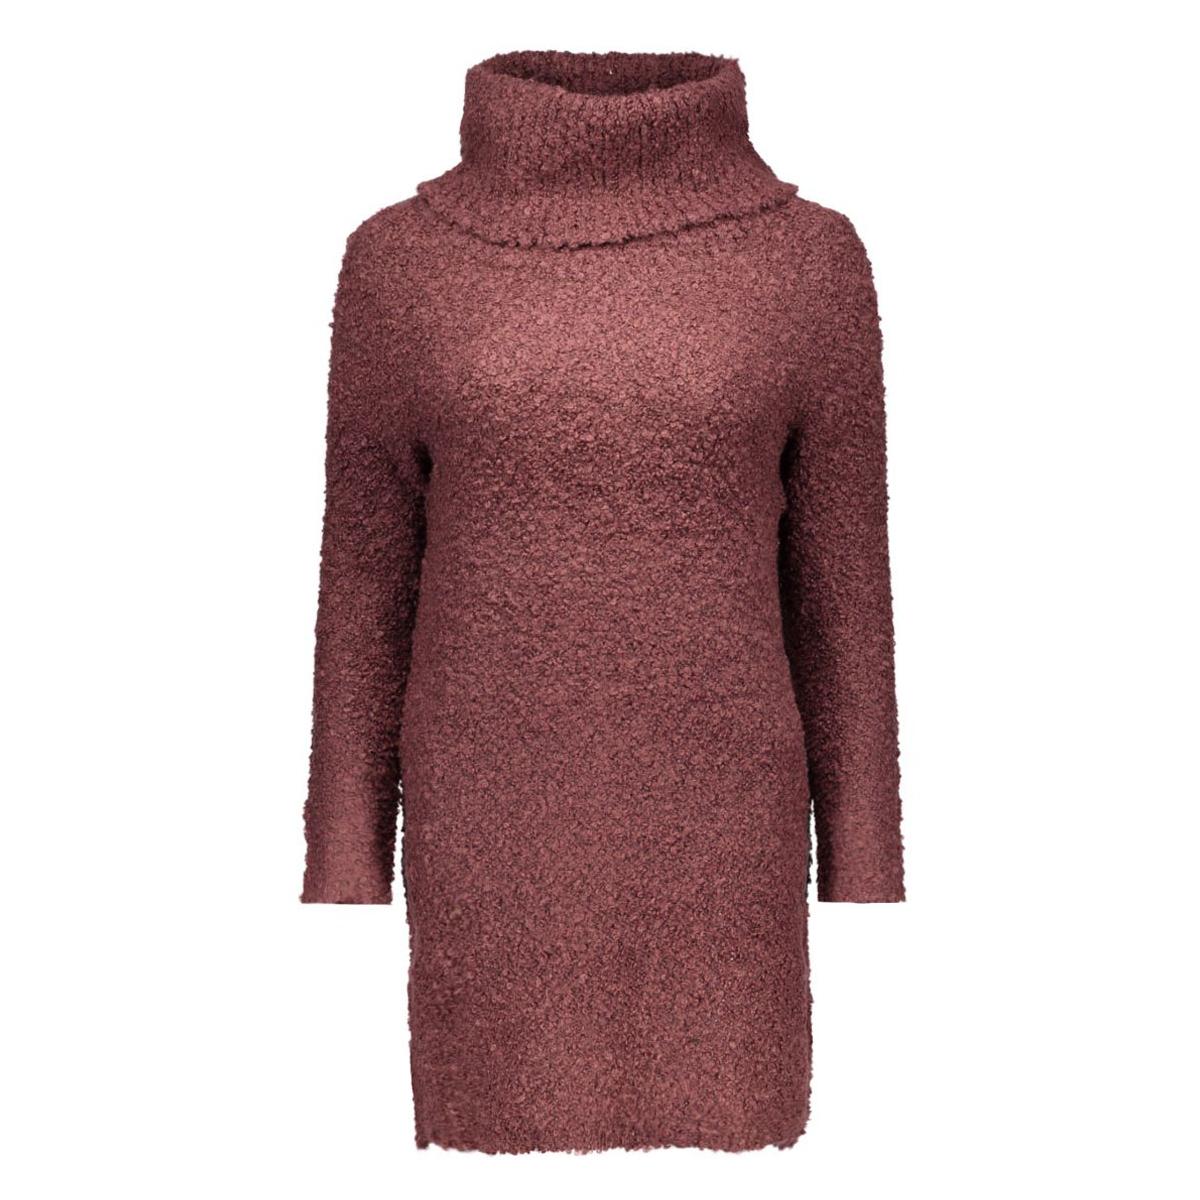 onlnew zadie l/s rollneck dress knt 15121795 only jurk fugde/w. black m